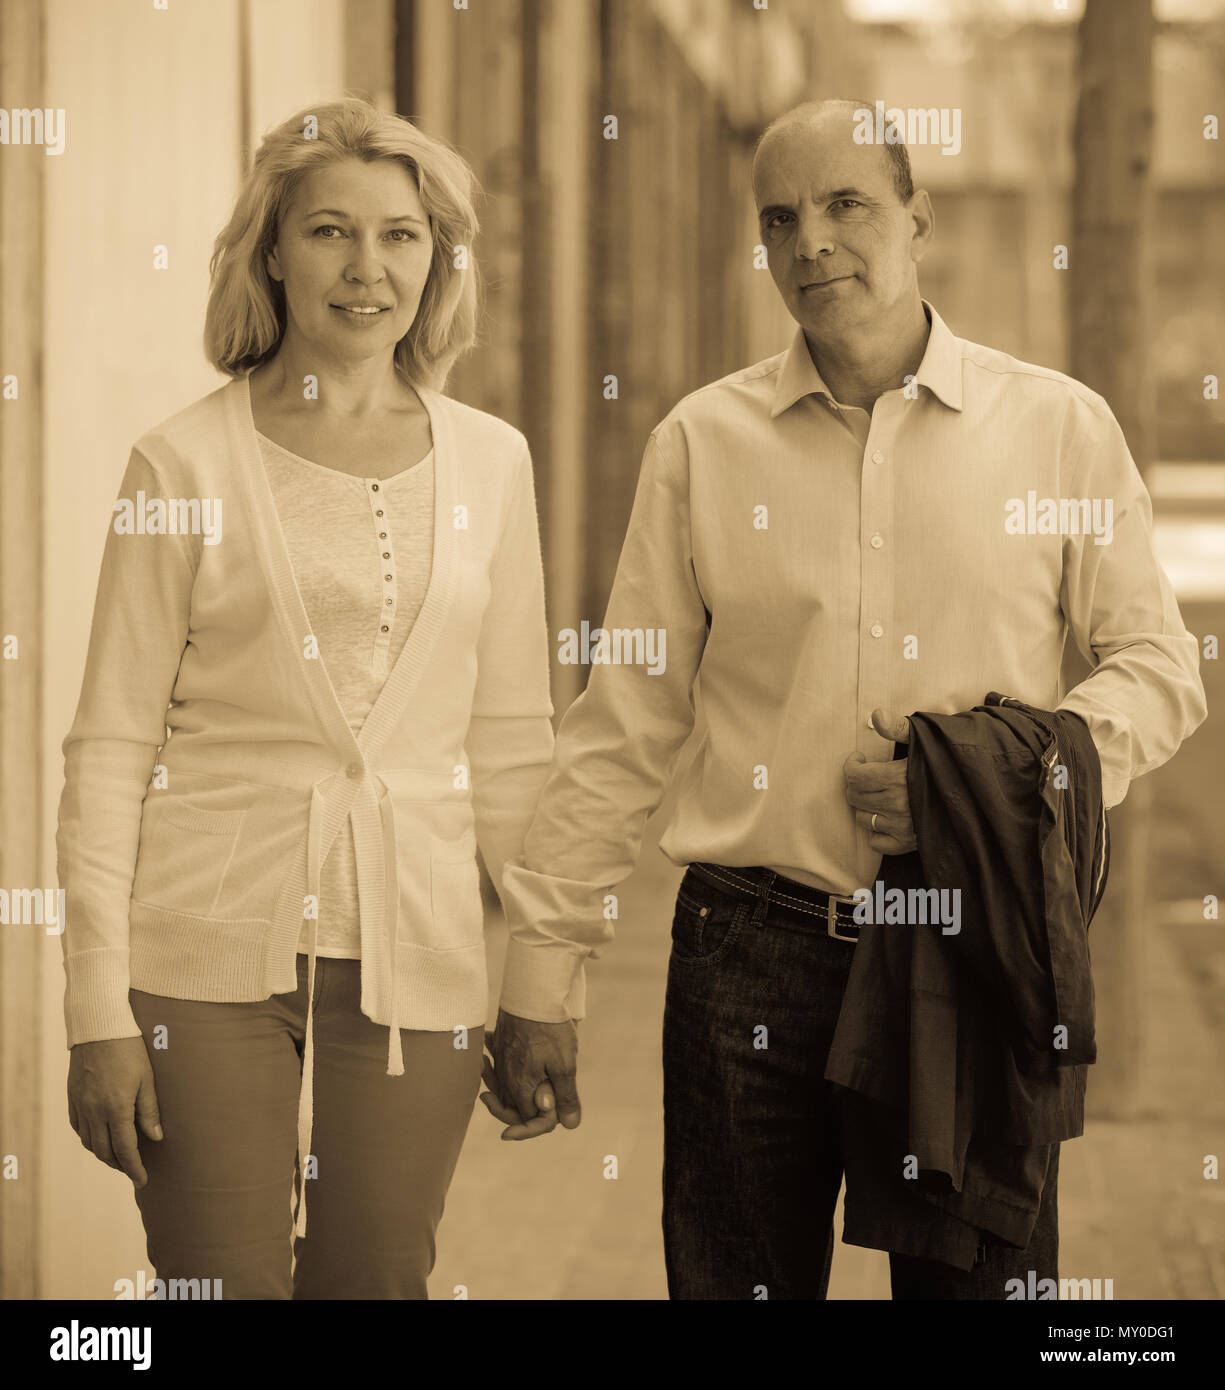 Mature style couple